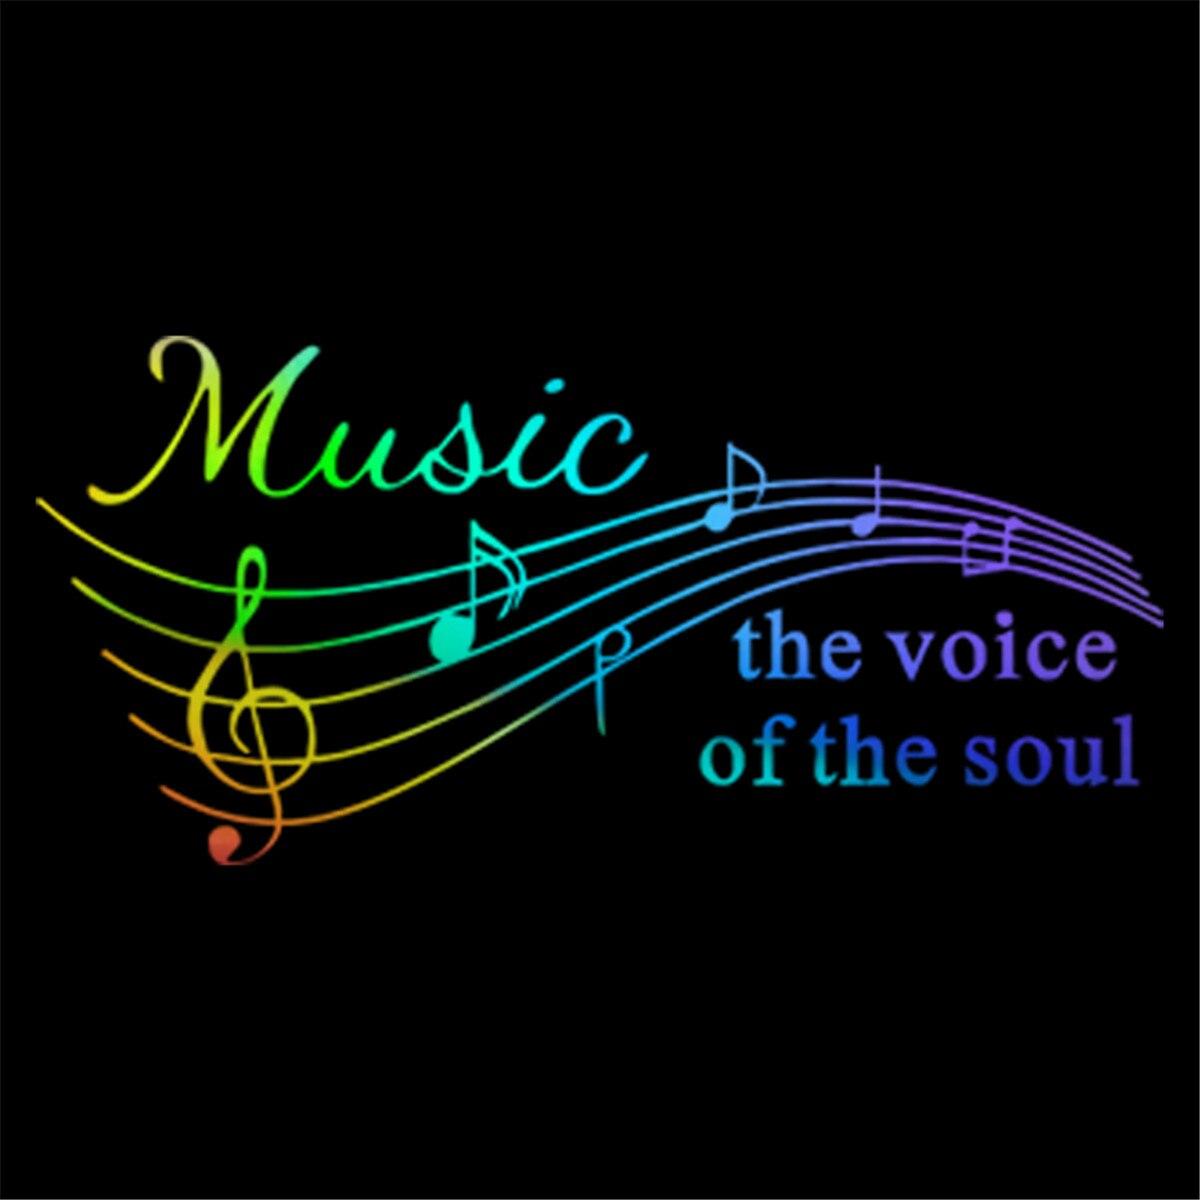 Música a voz da alma Vinil Removível Decalques Decors Adesivos Instrumen art